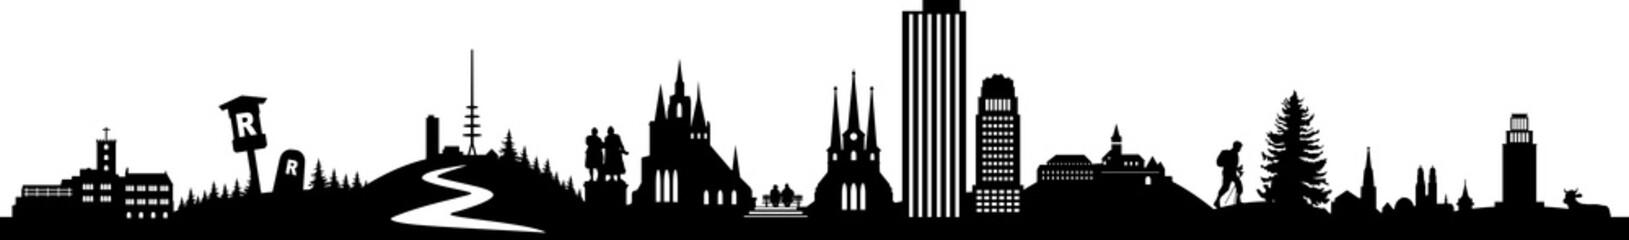 Thüringen Skyline Landscape